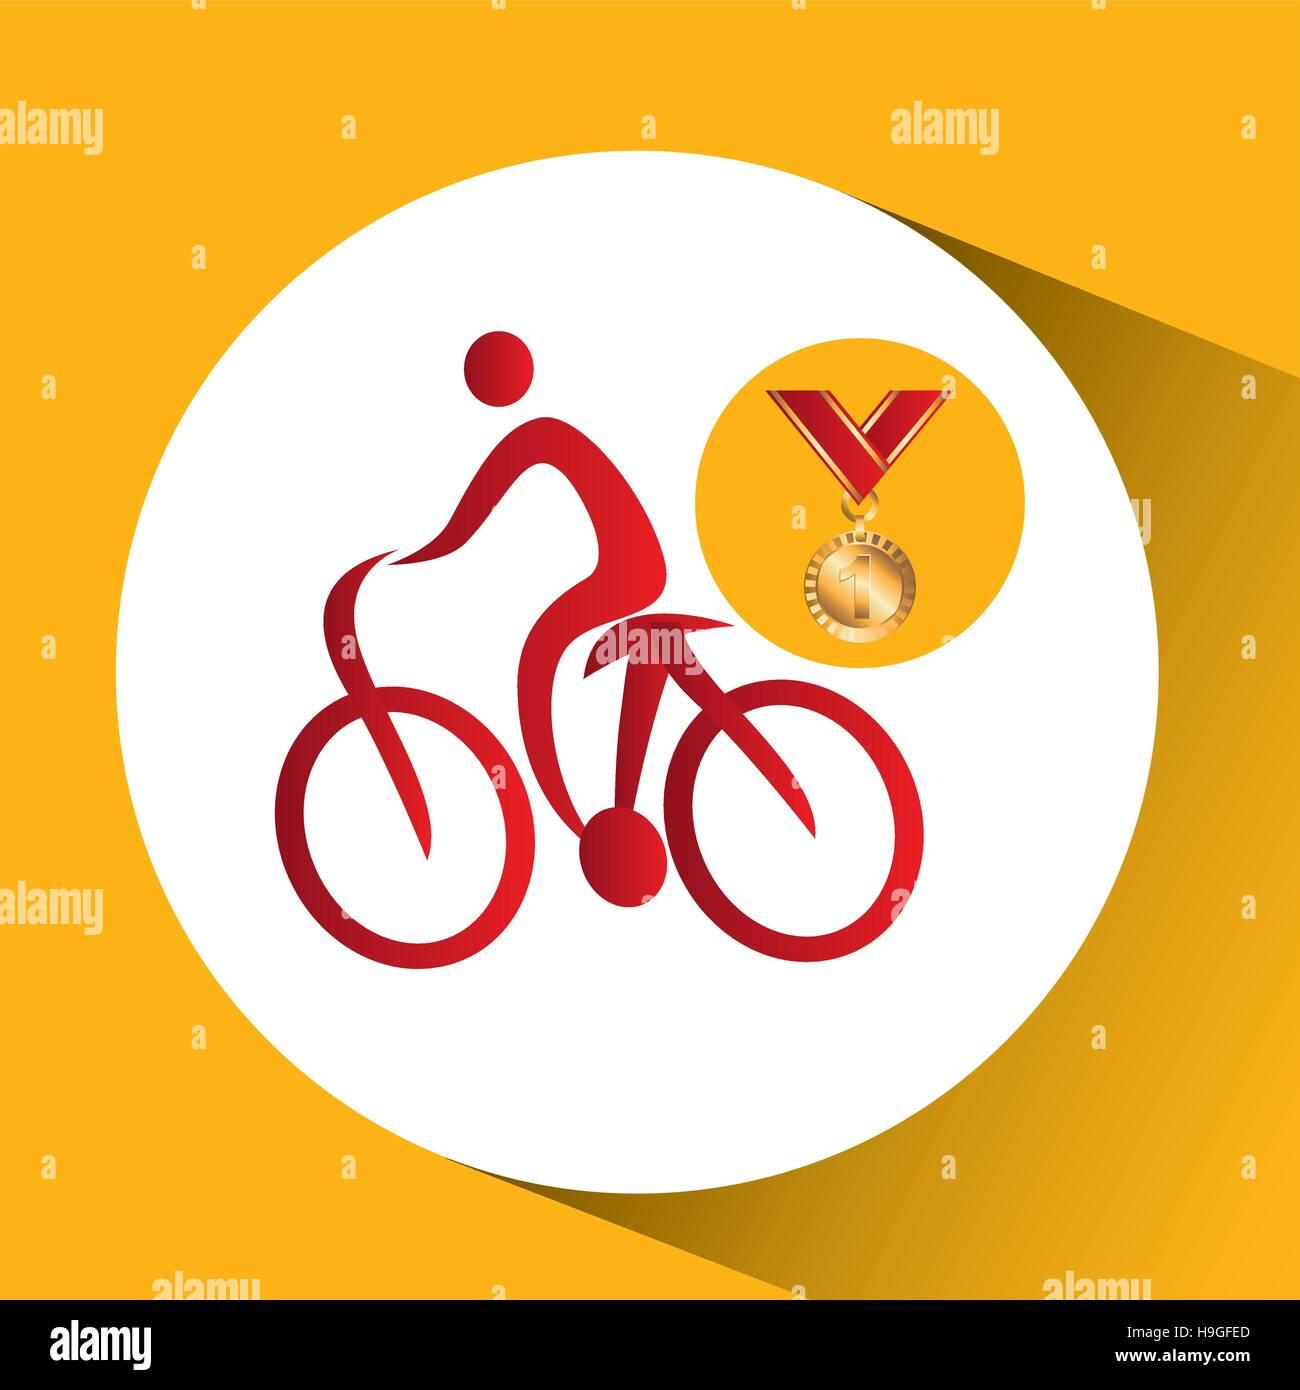 olympic gold medal mountain bike vector illustration eps 10 - Stock Vector